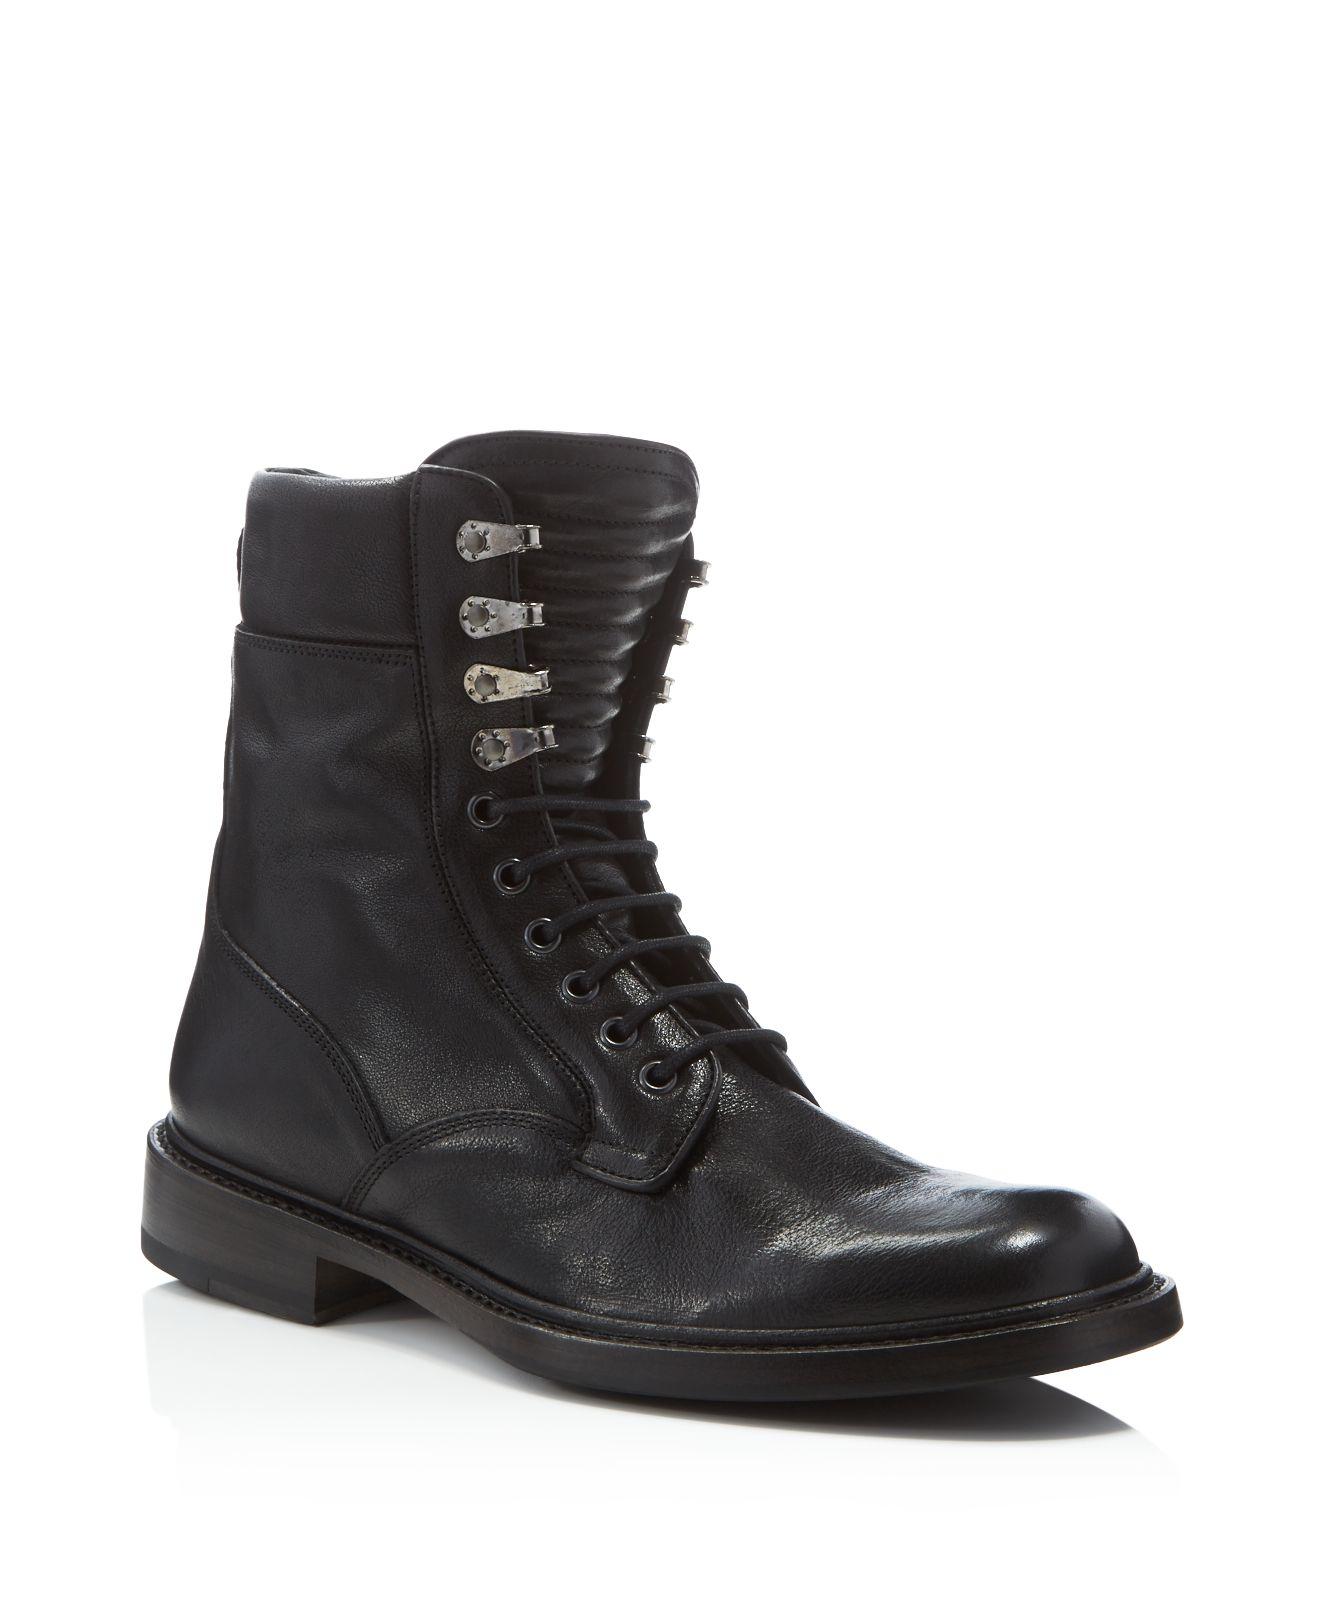 Rag Amp Bone Spencer Commando Leather Boots In Black For Men